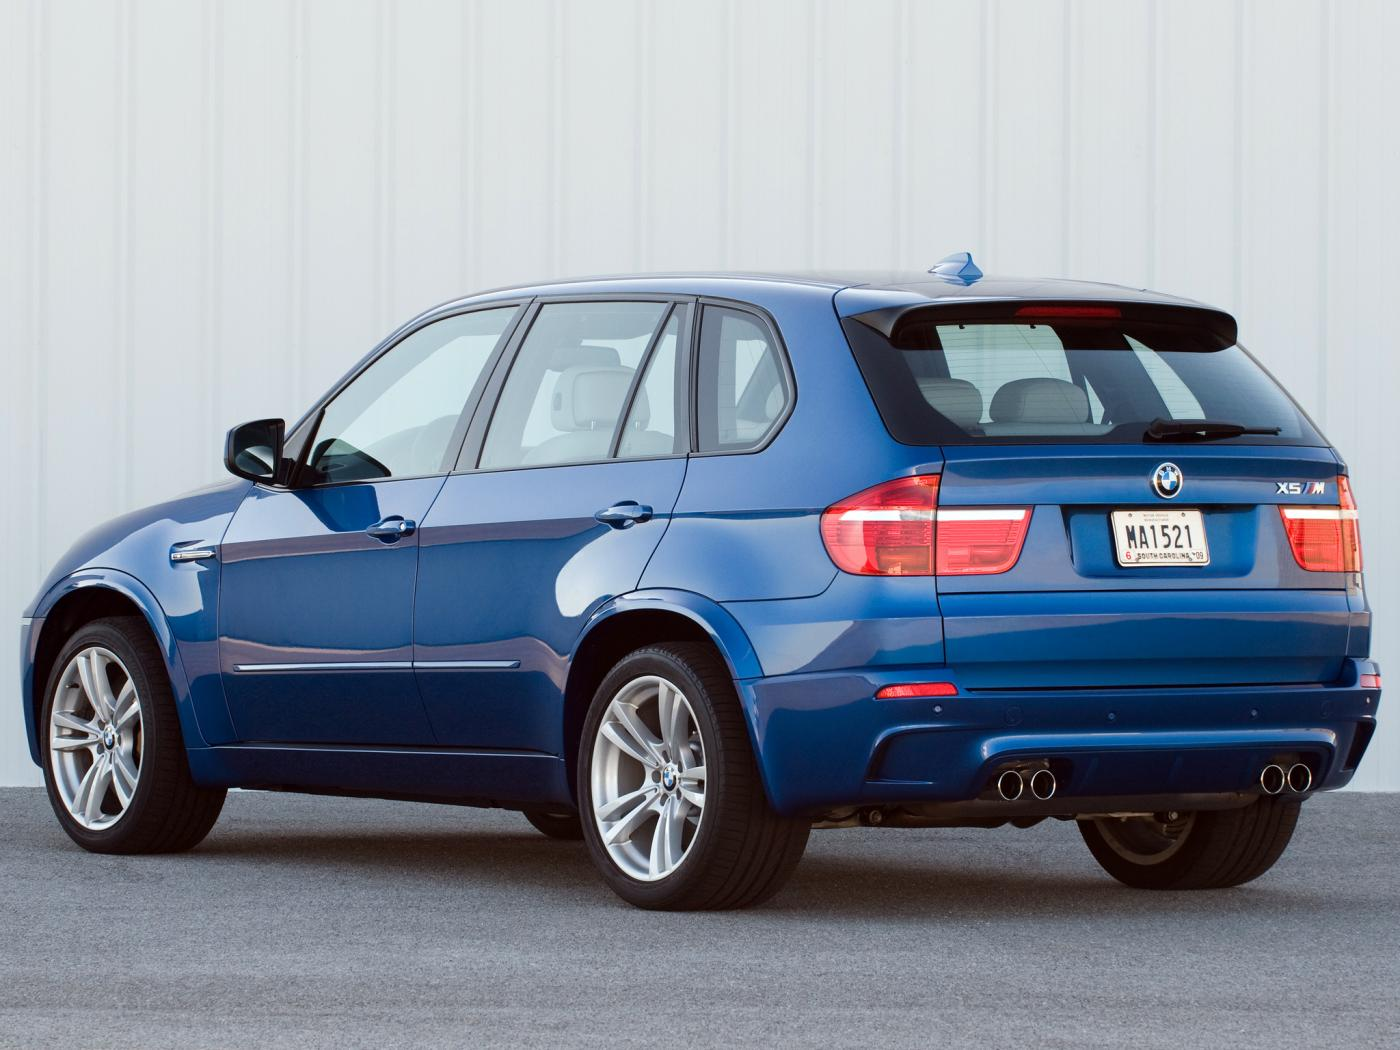 BMW-X5-M-E70-2